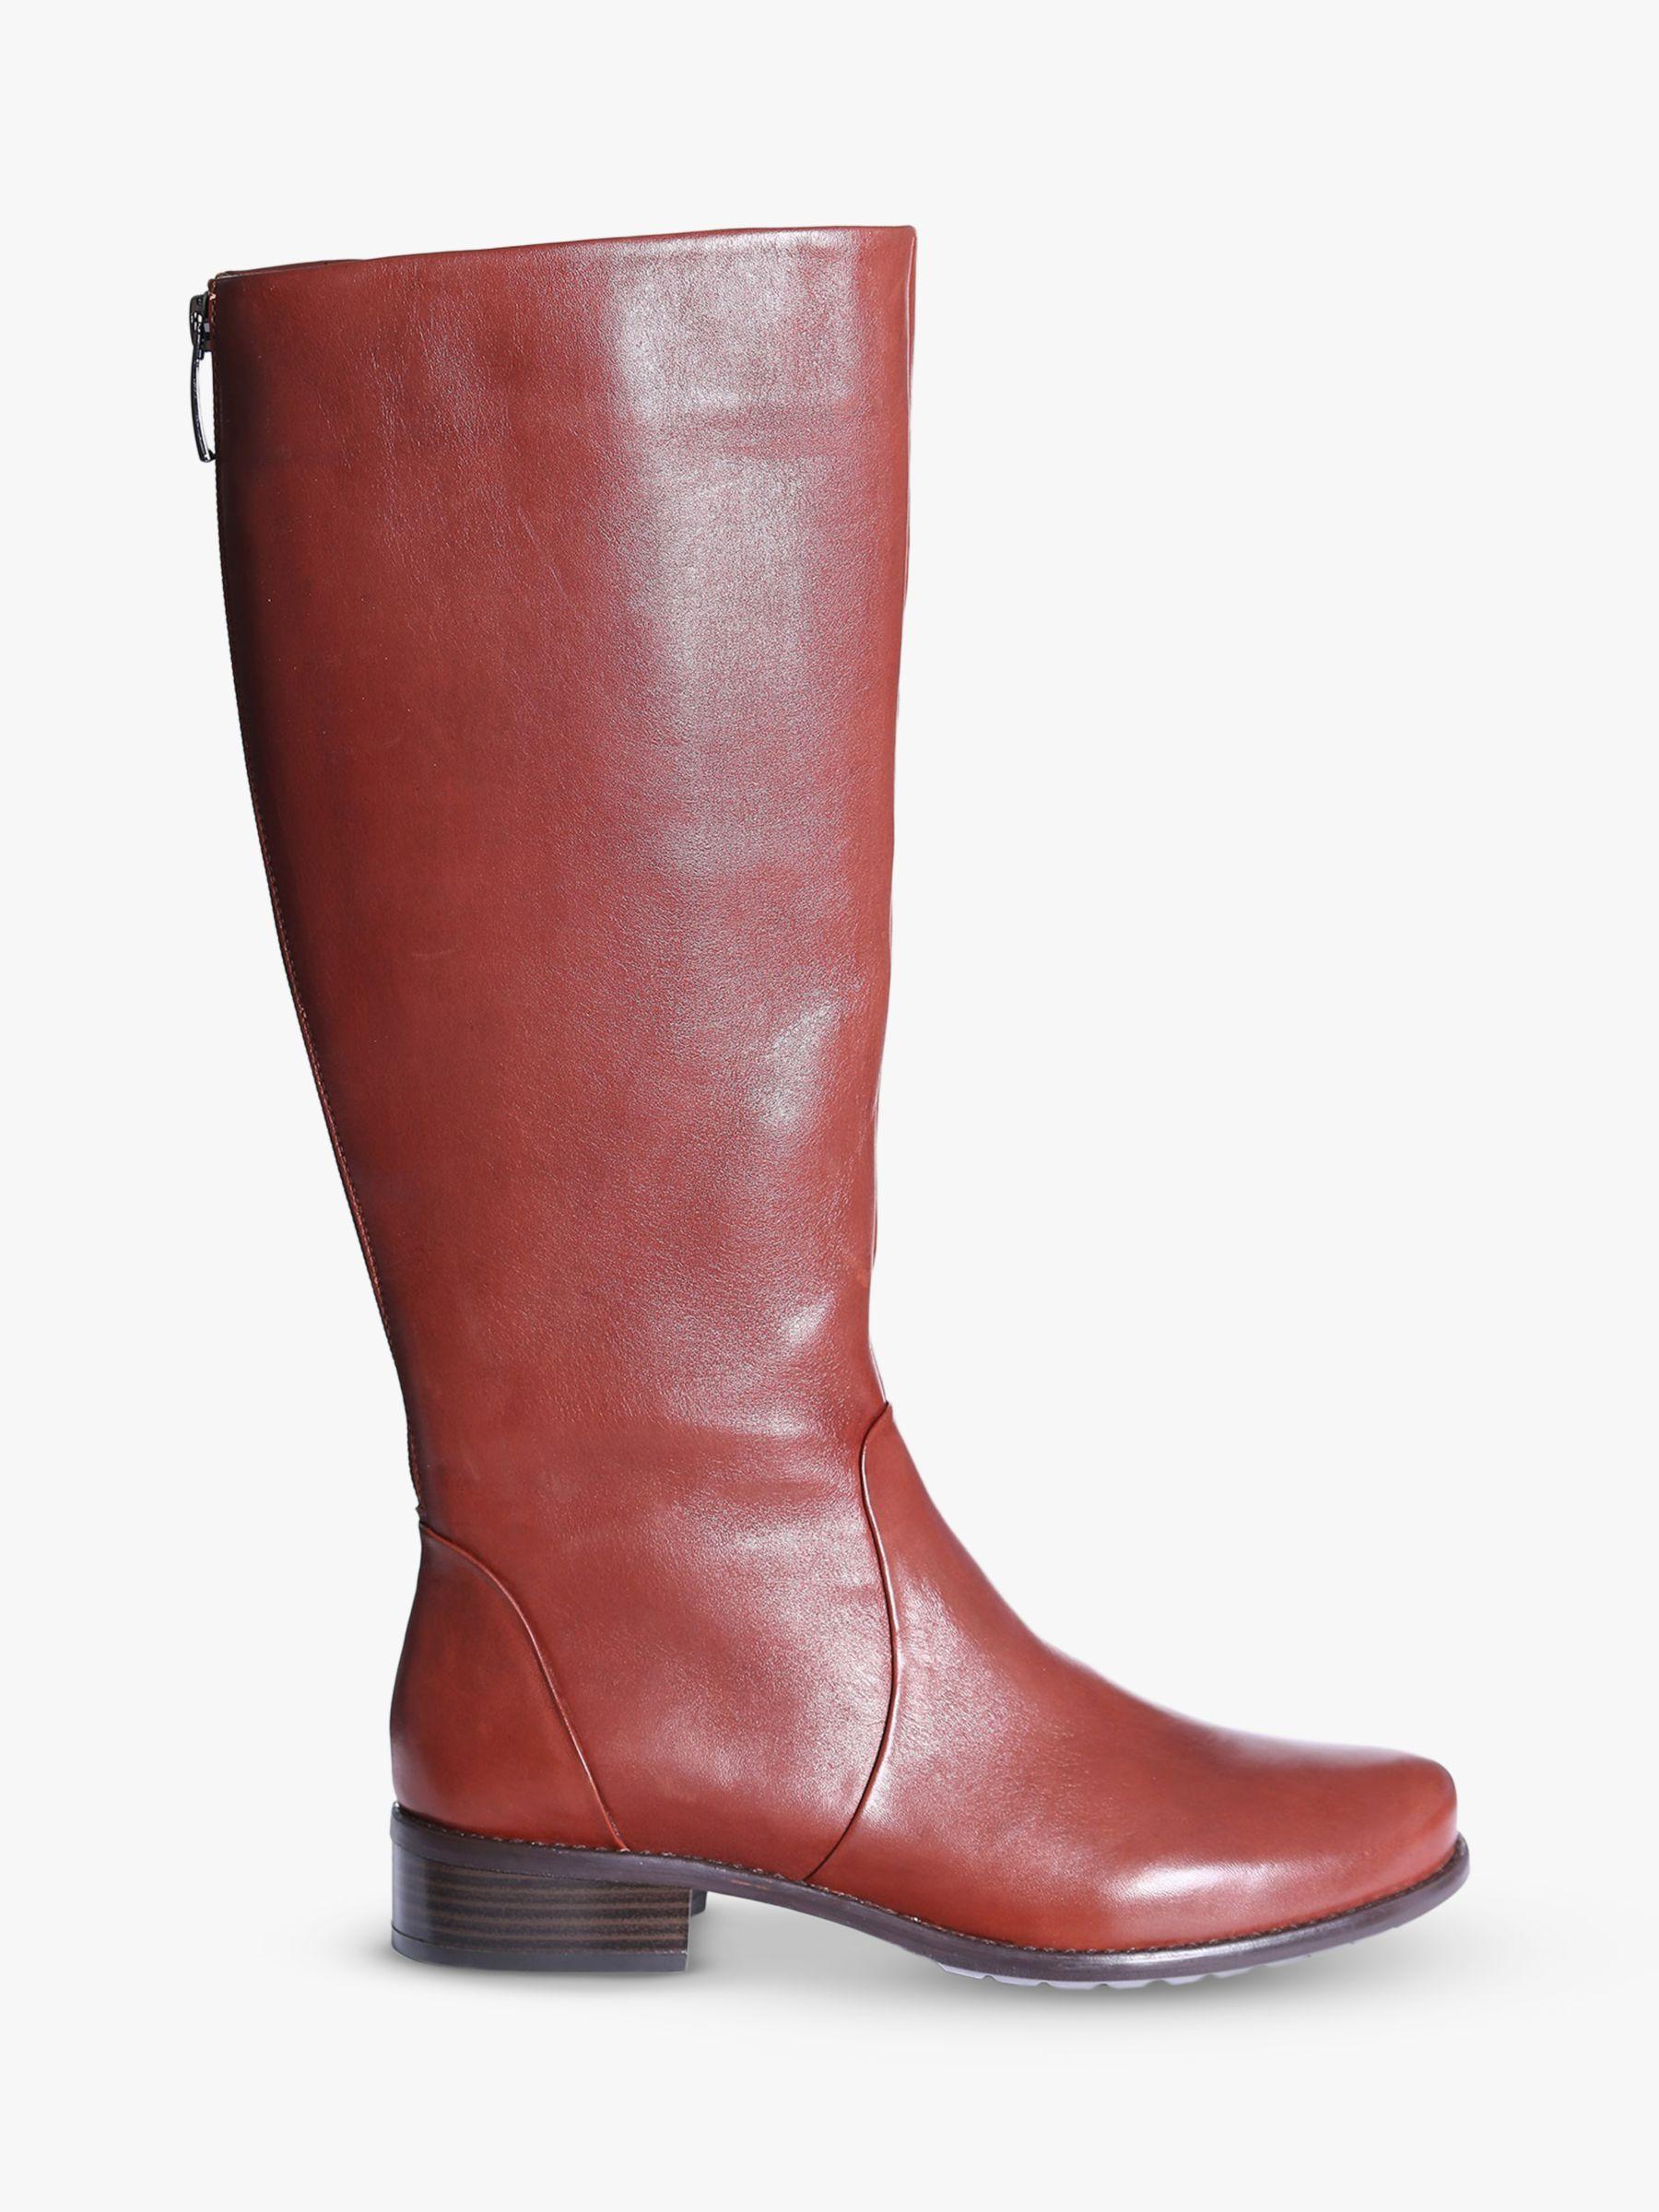 Josef Seibel Josef Seibel Alicia 3 Leather Knee High Boots, Tan